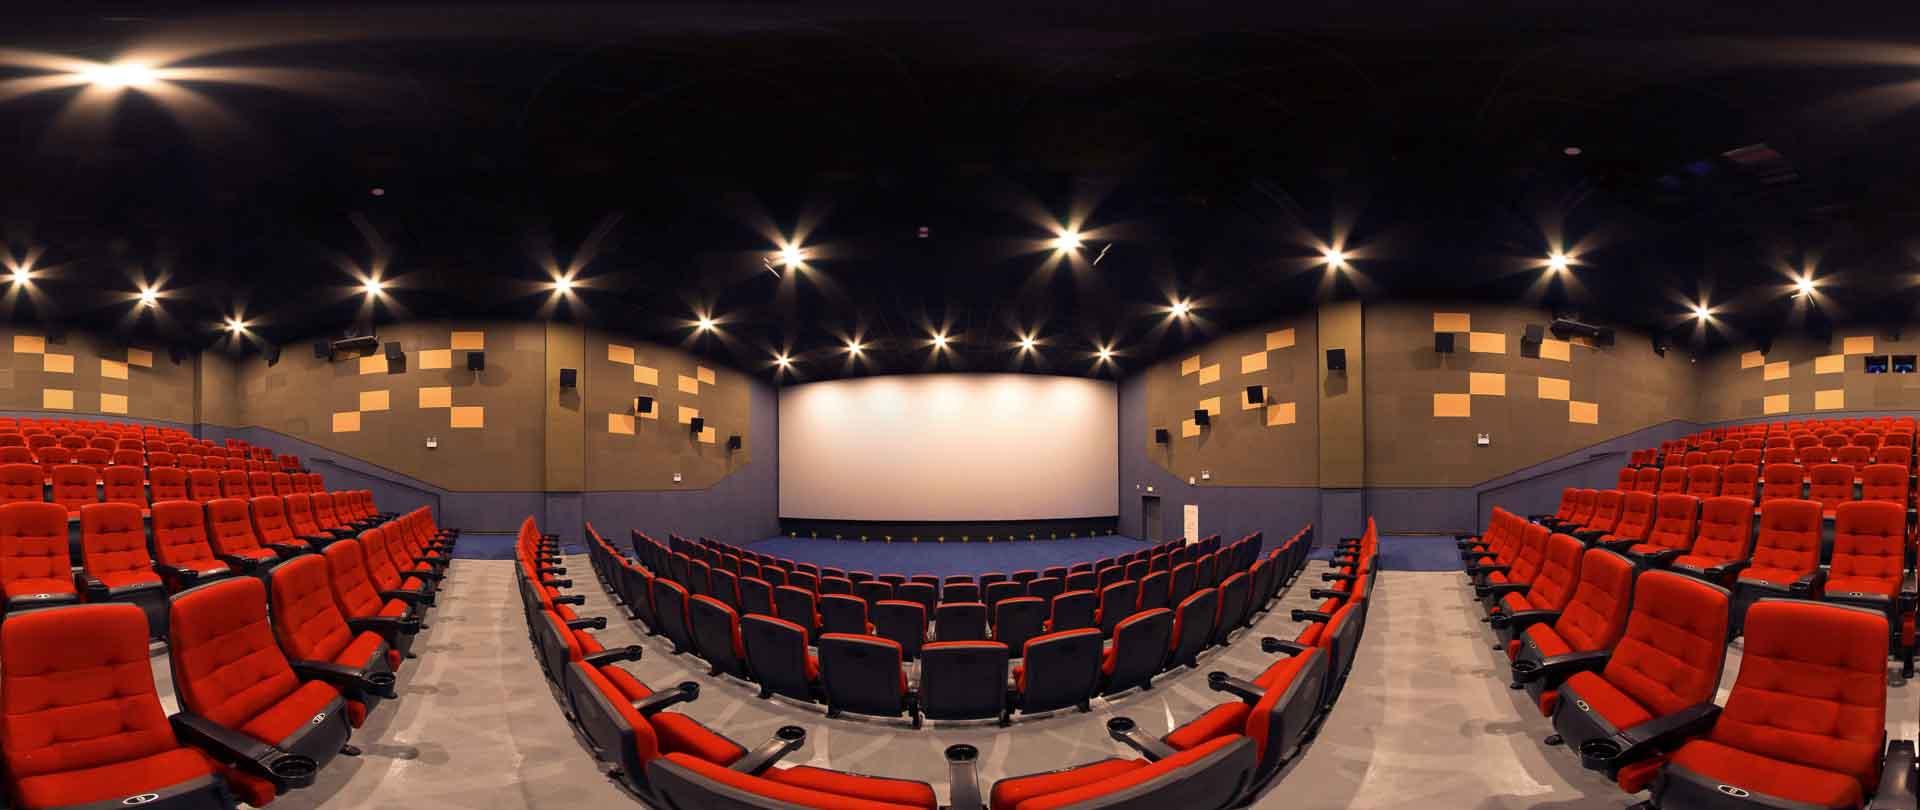 virtual tour 360 Cinema